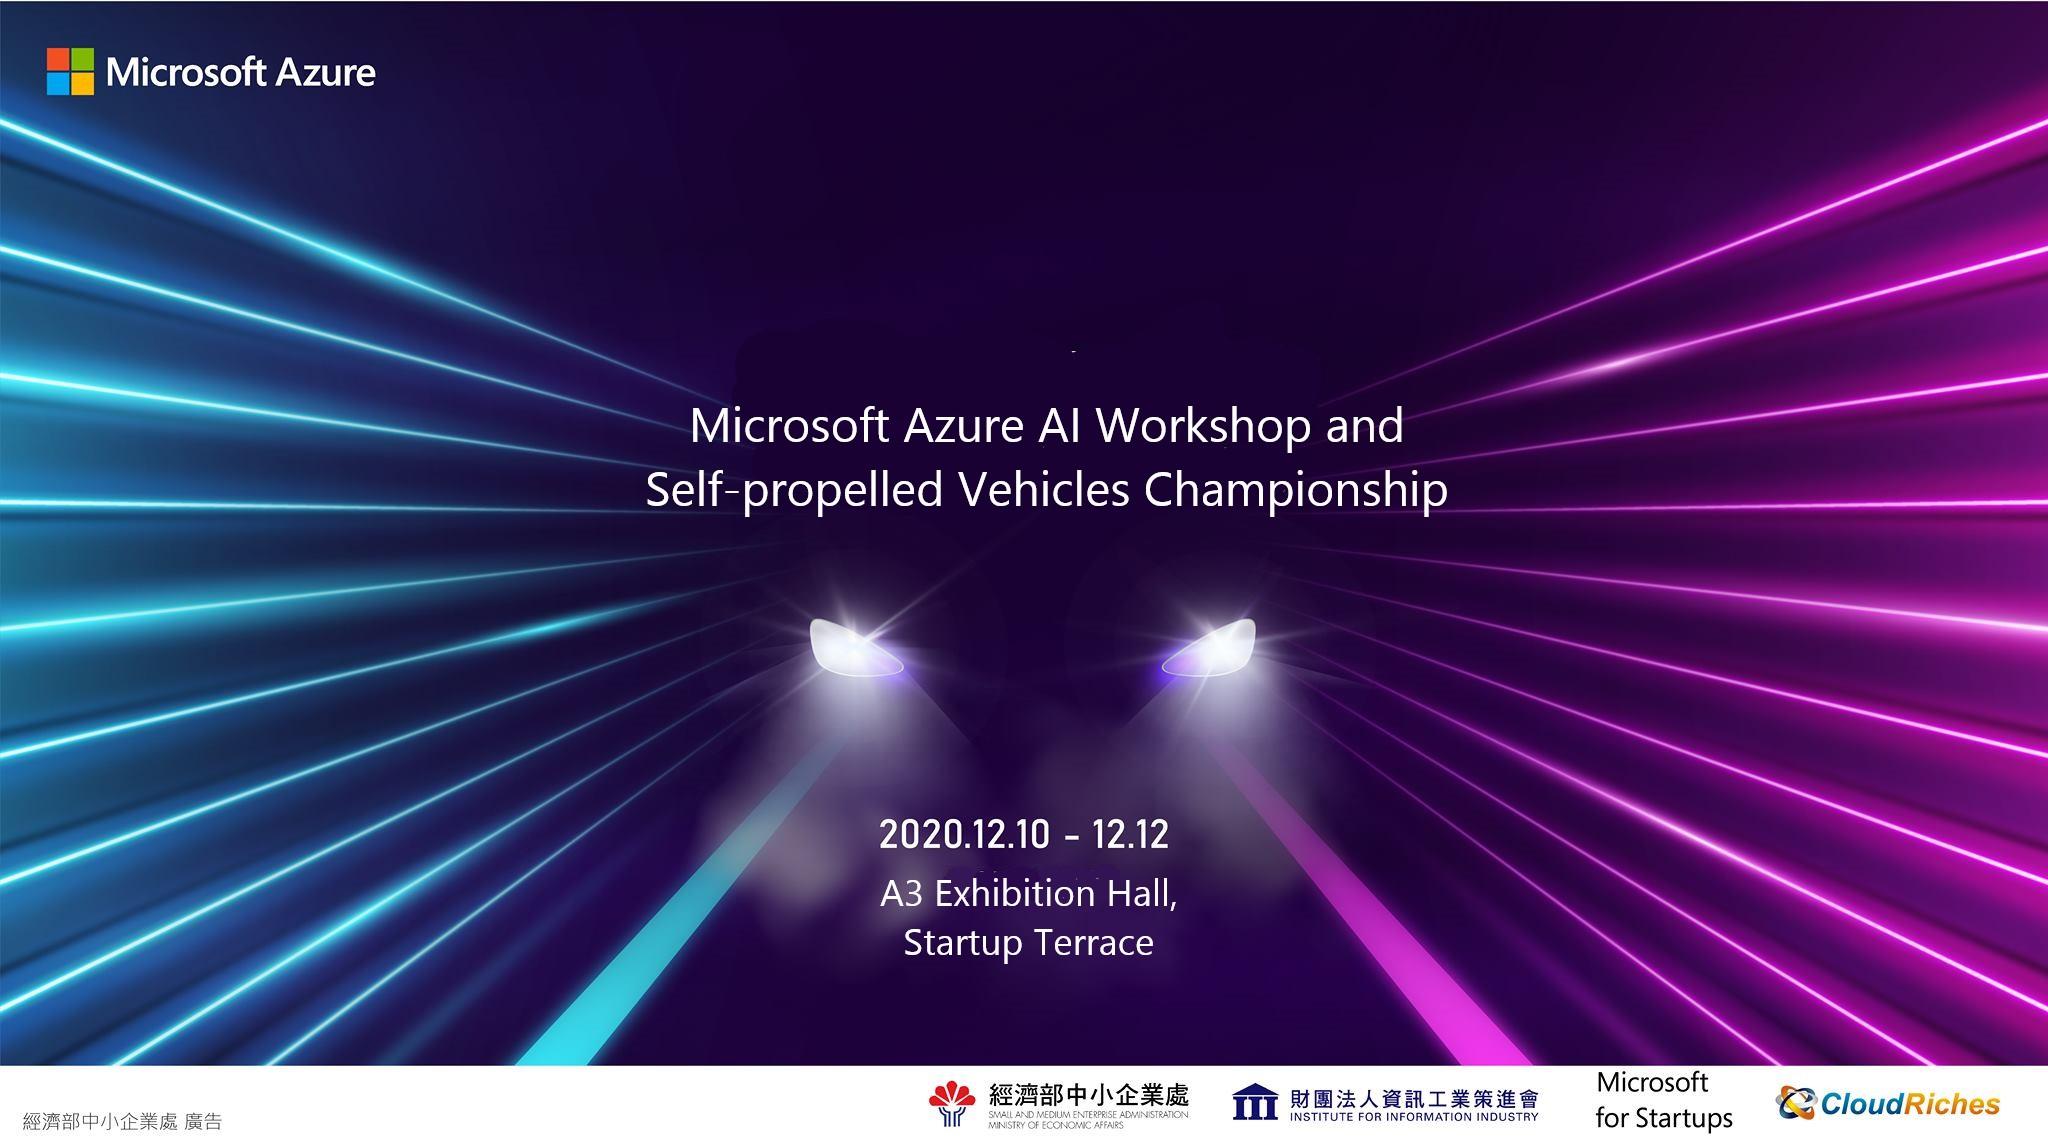 Microsoft Azure AI Workshop and Self-propelled Vehicles Championship